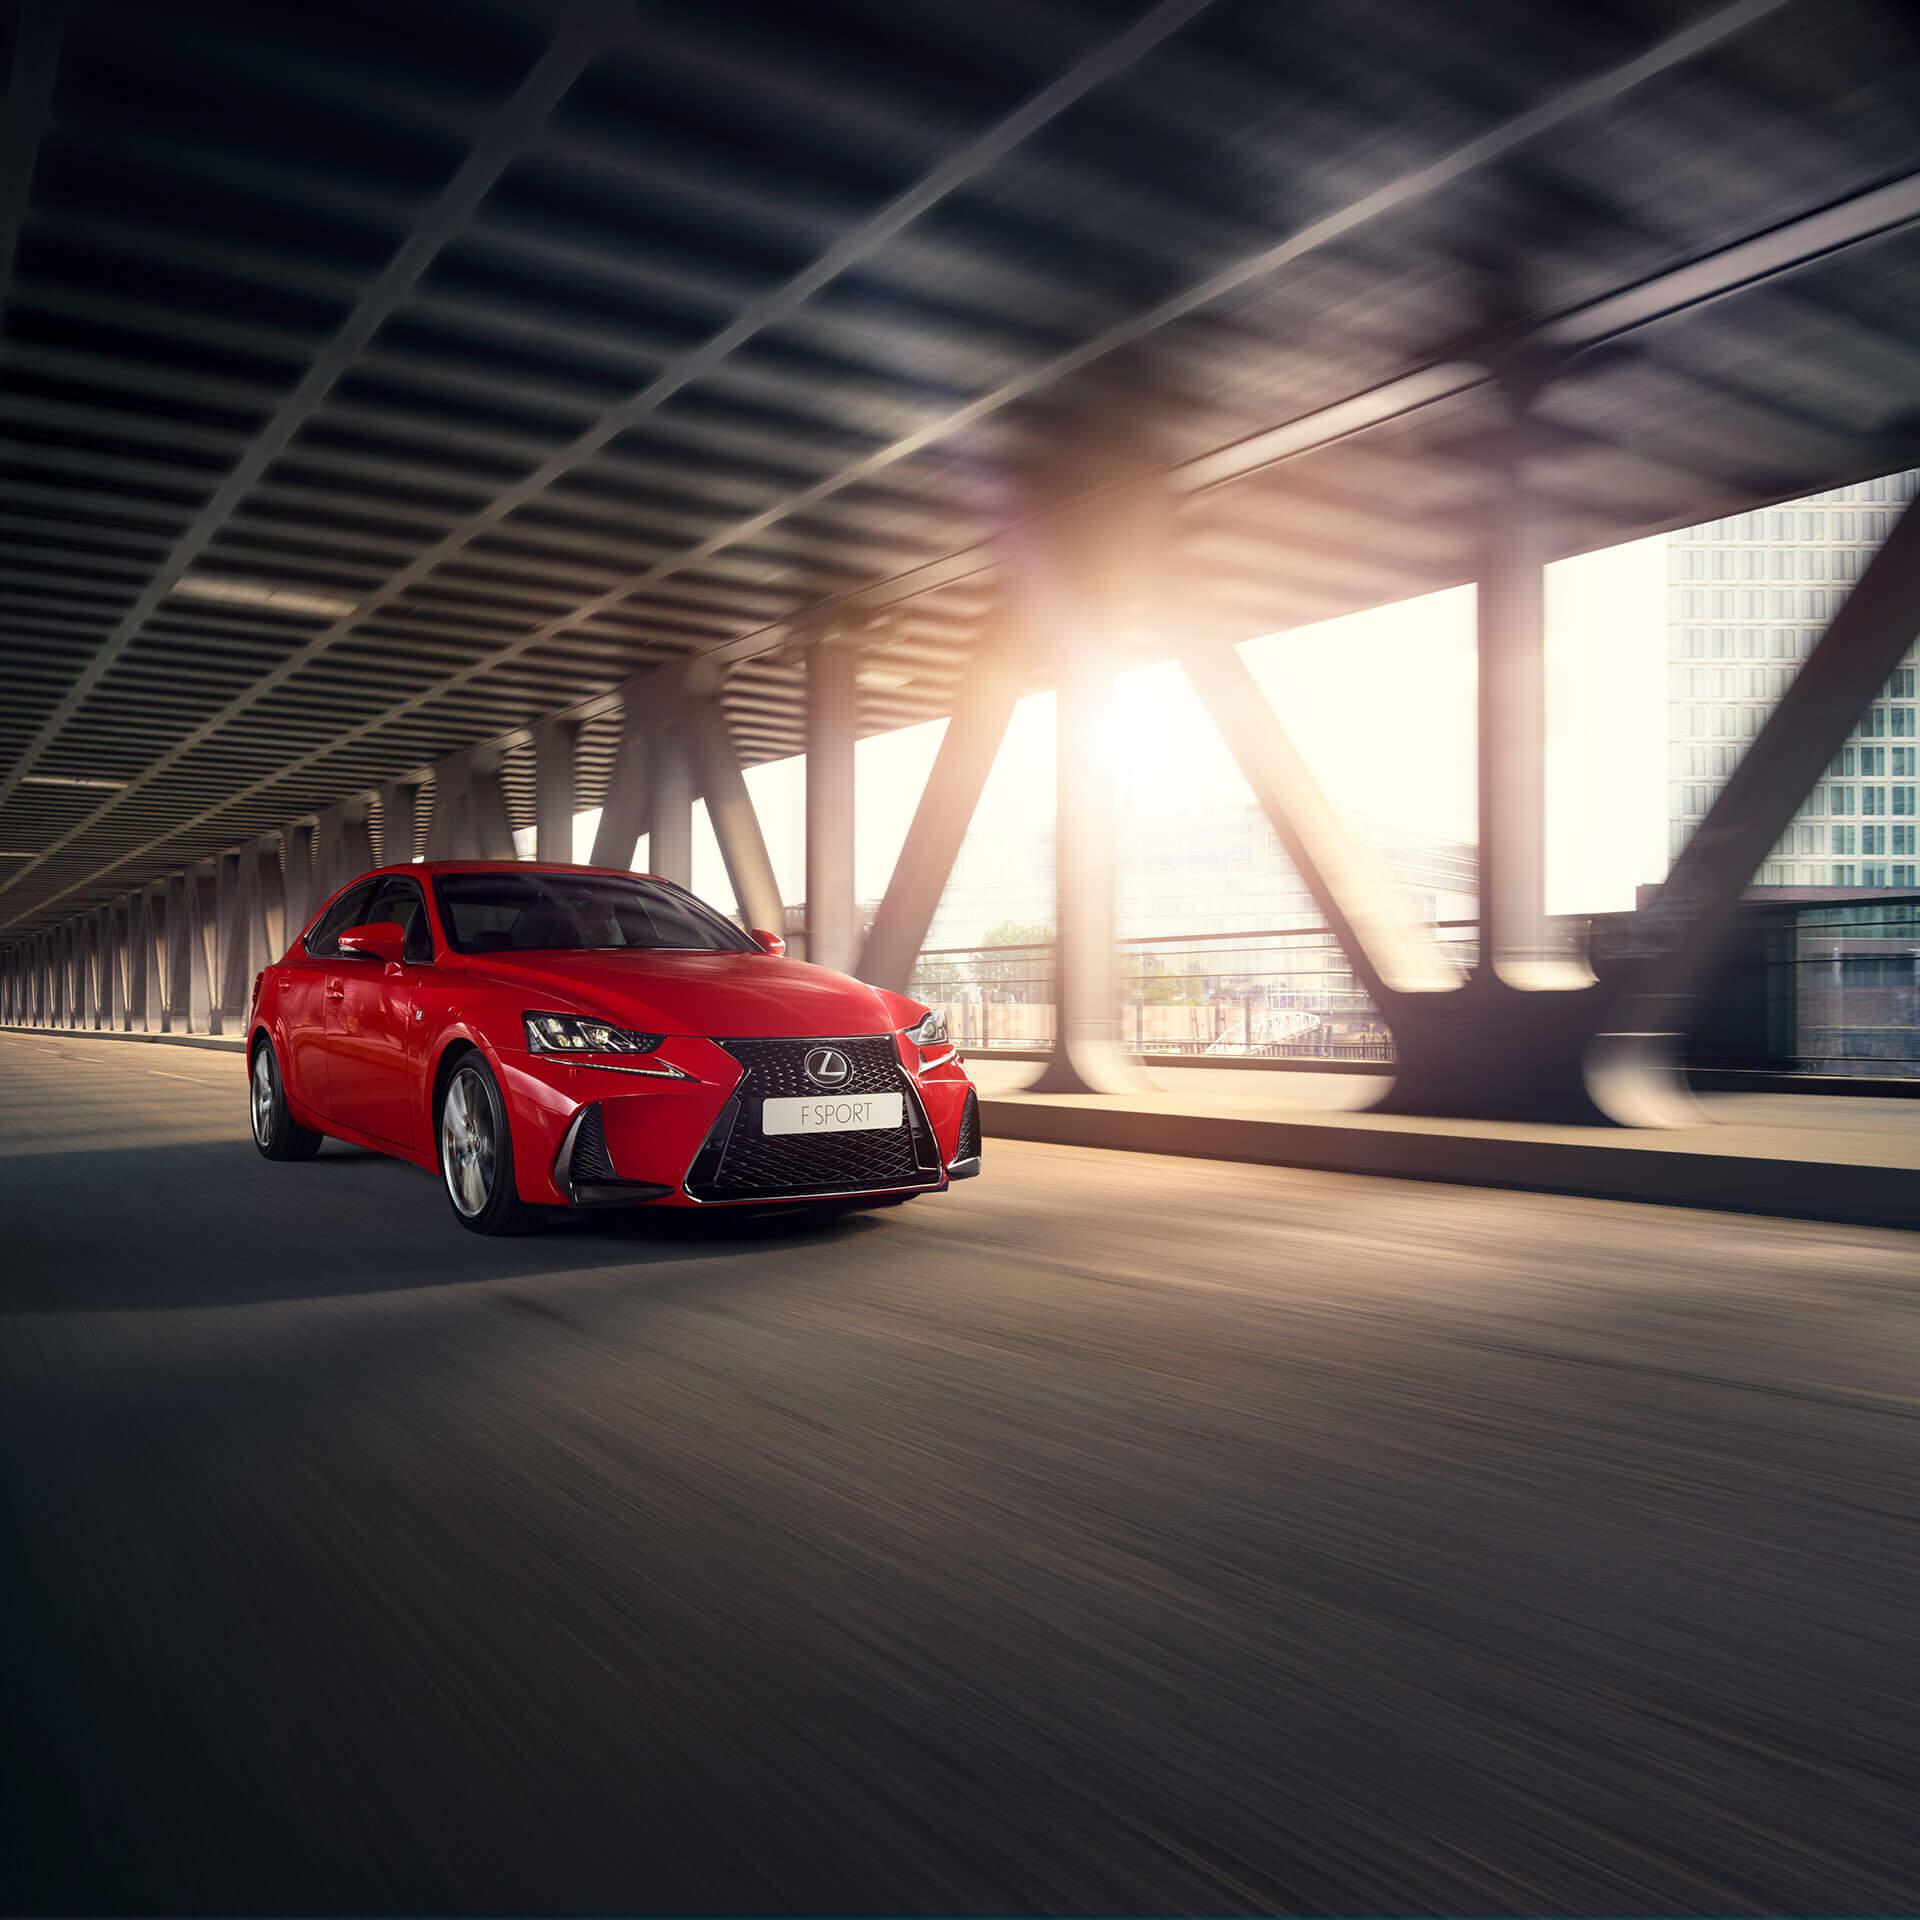 En rød Lexus F Sport kjører under en bru